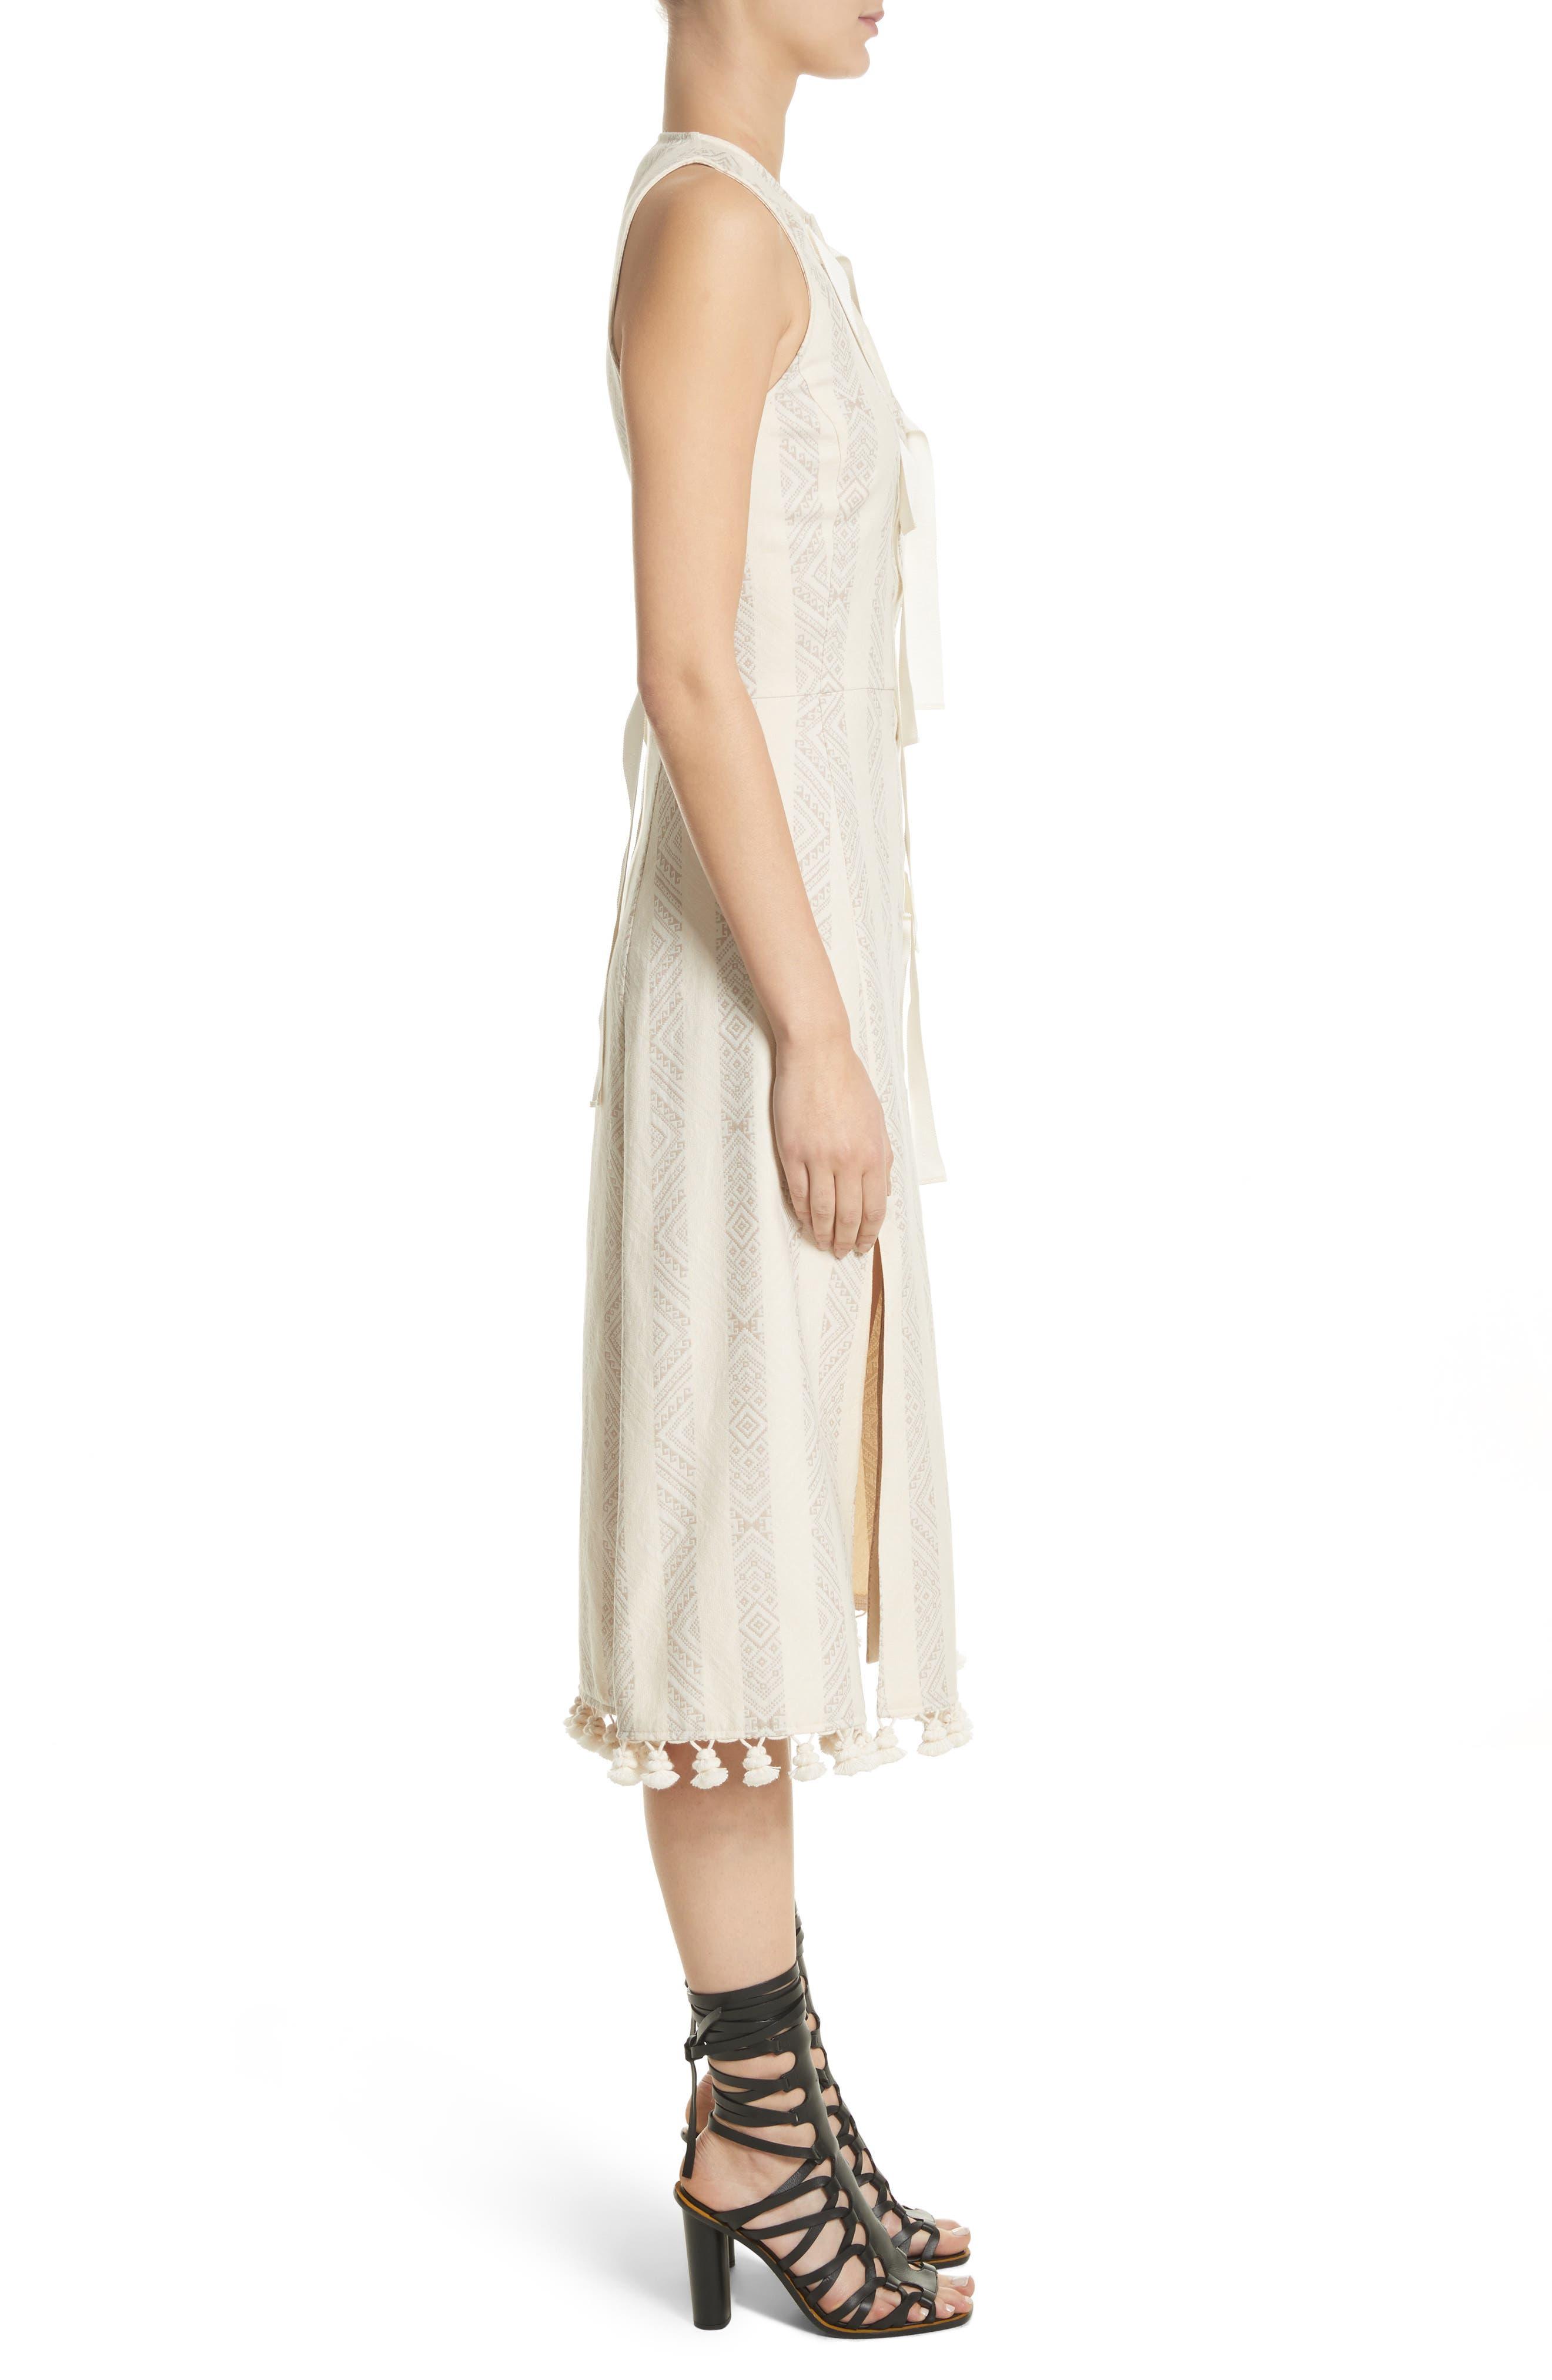 Grosgrain Tie Stripe Dress,                             Alternate thumbnail 3, color,                             106